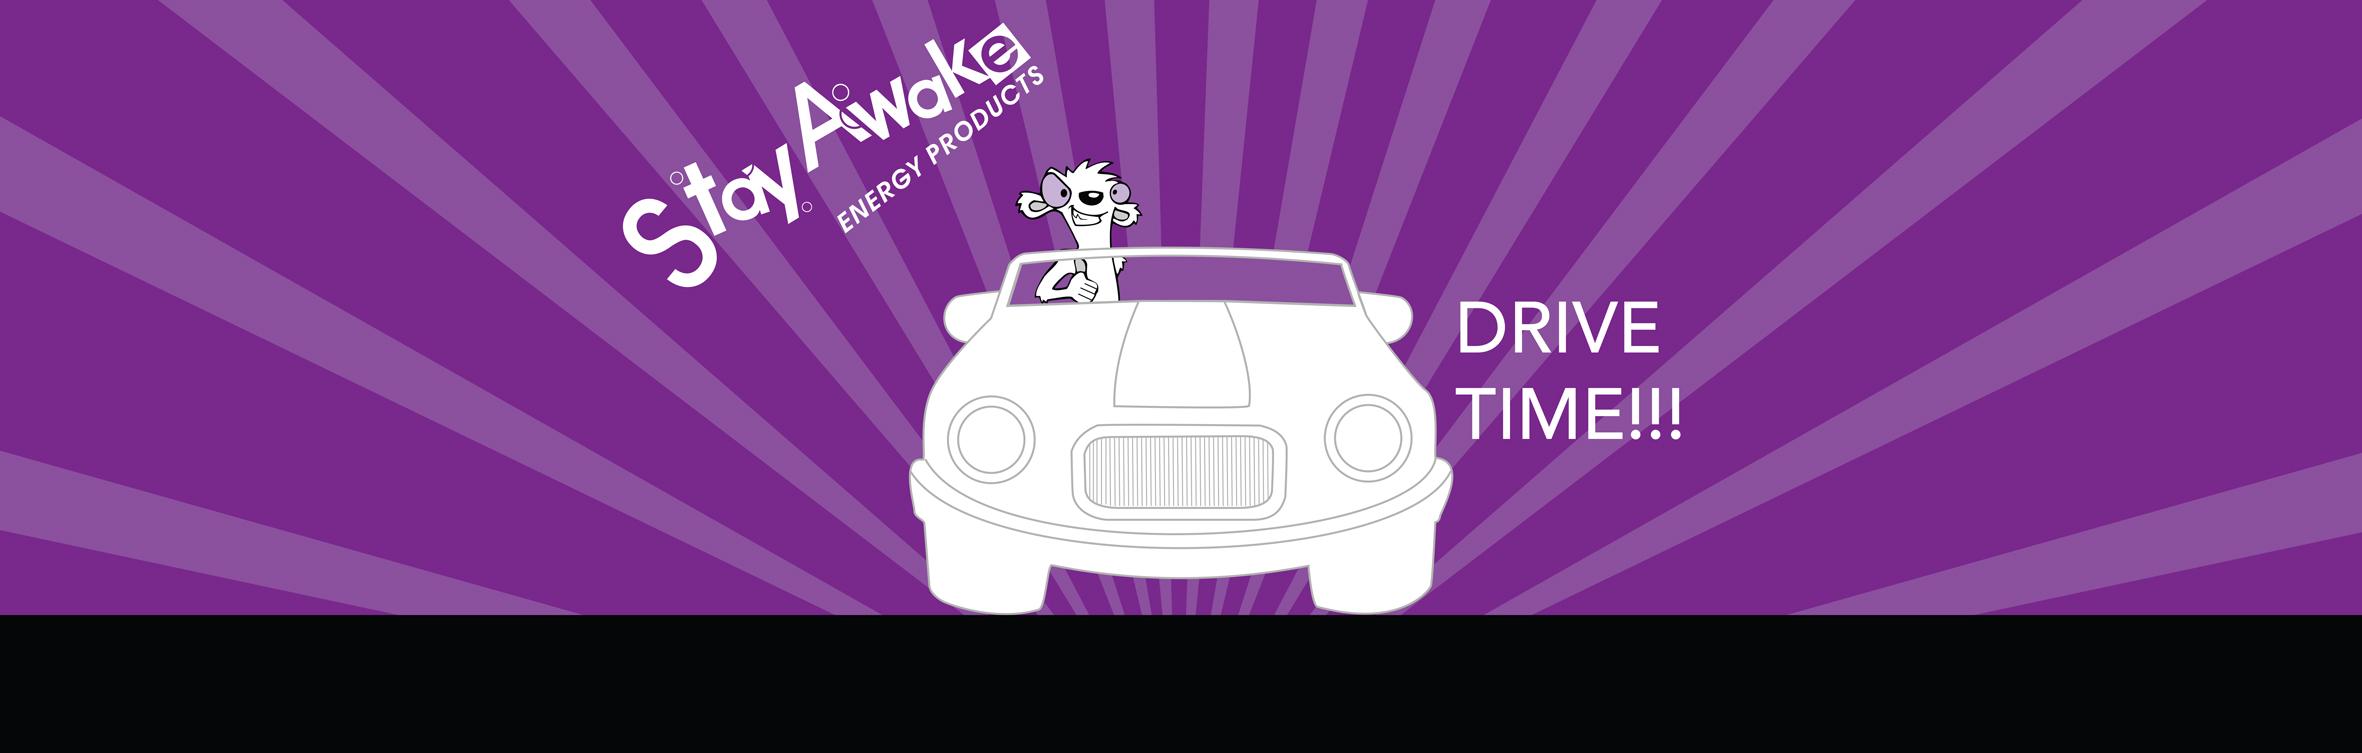 Stay-Awake-Drive-Time